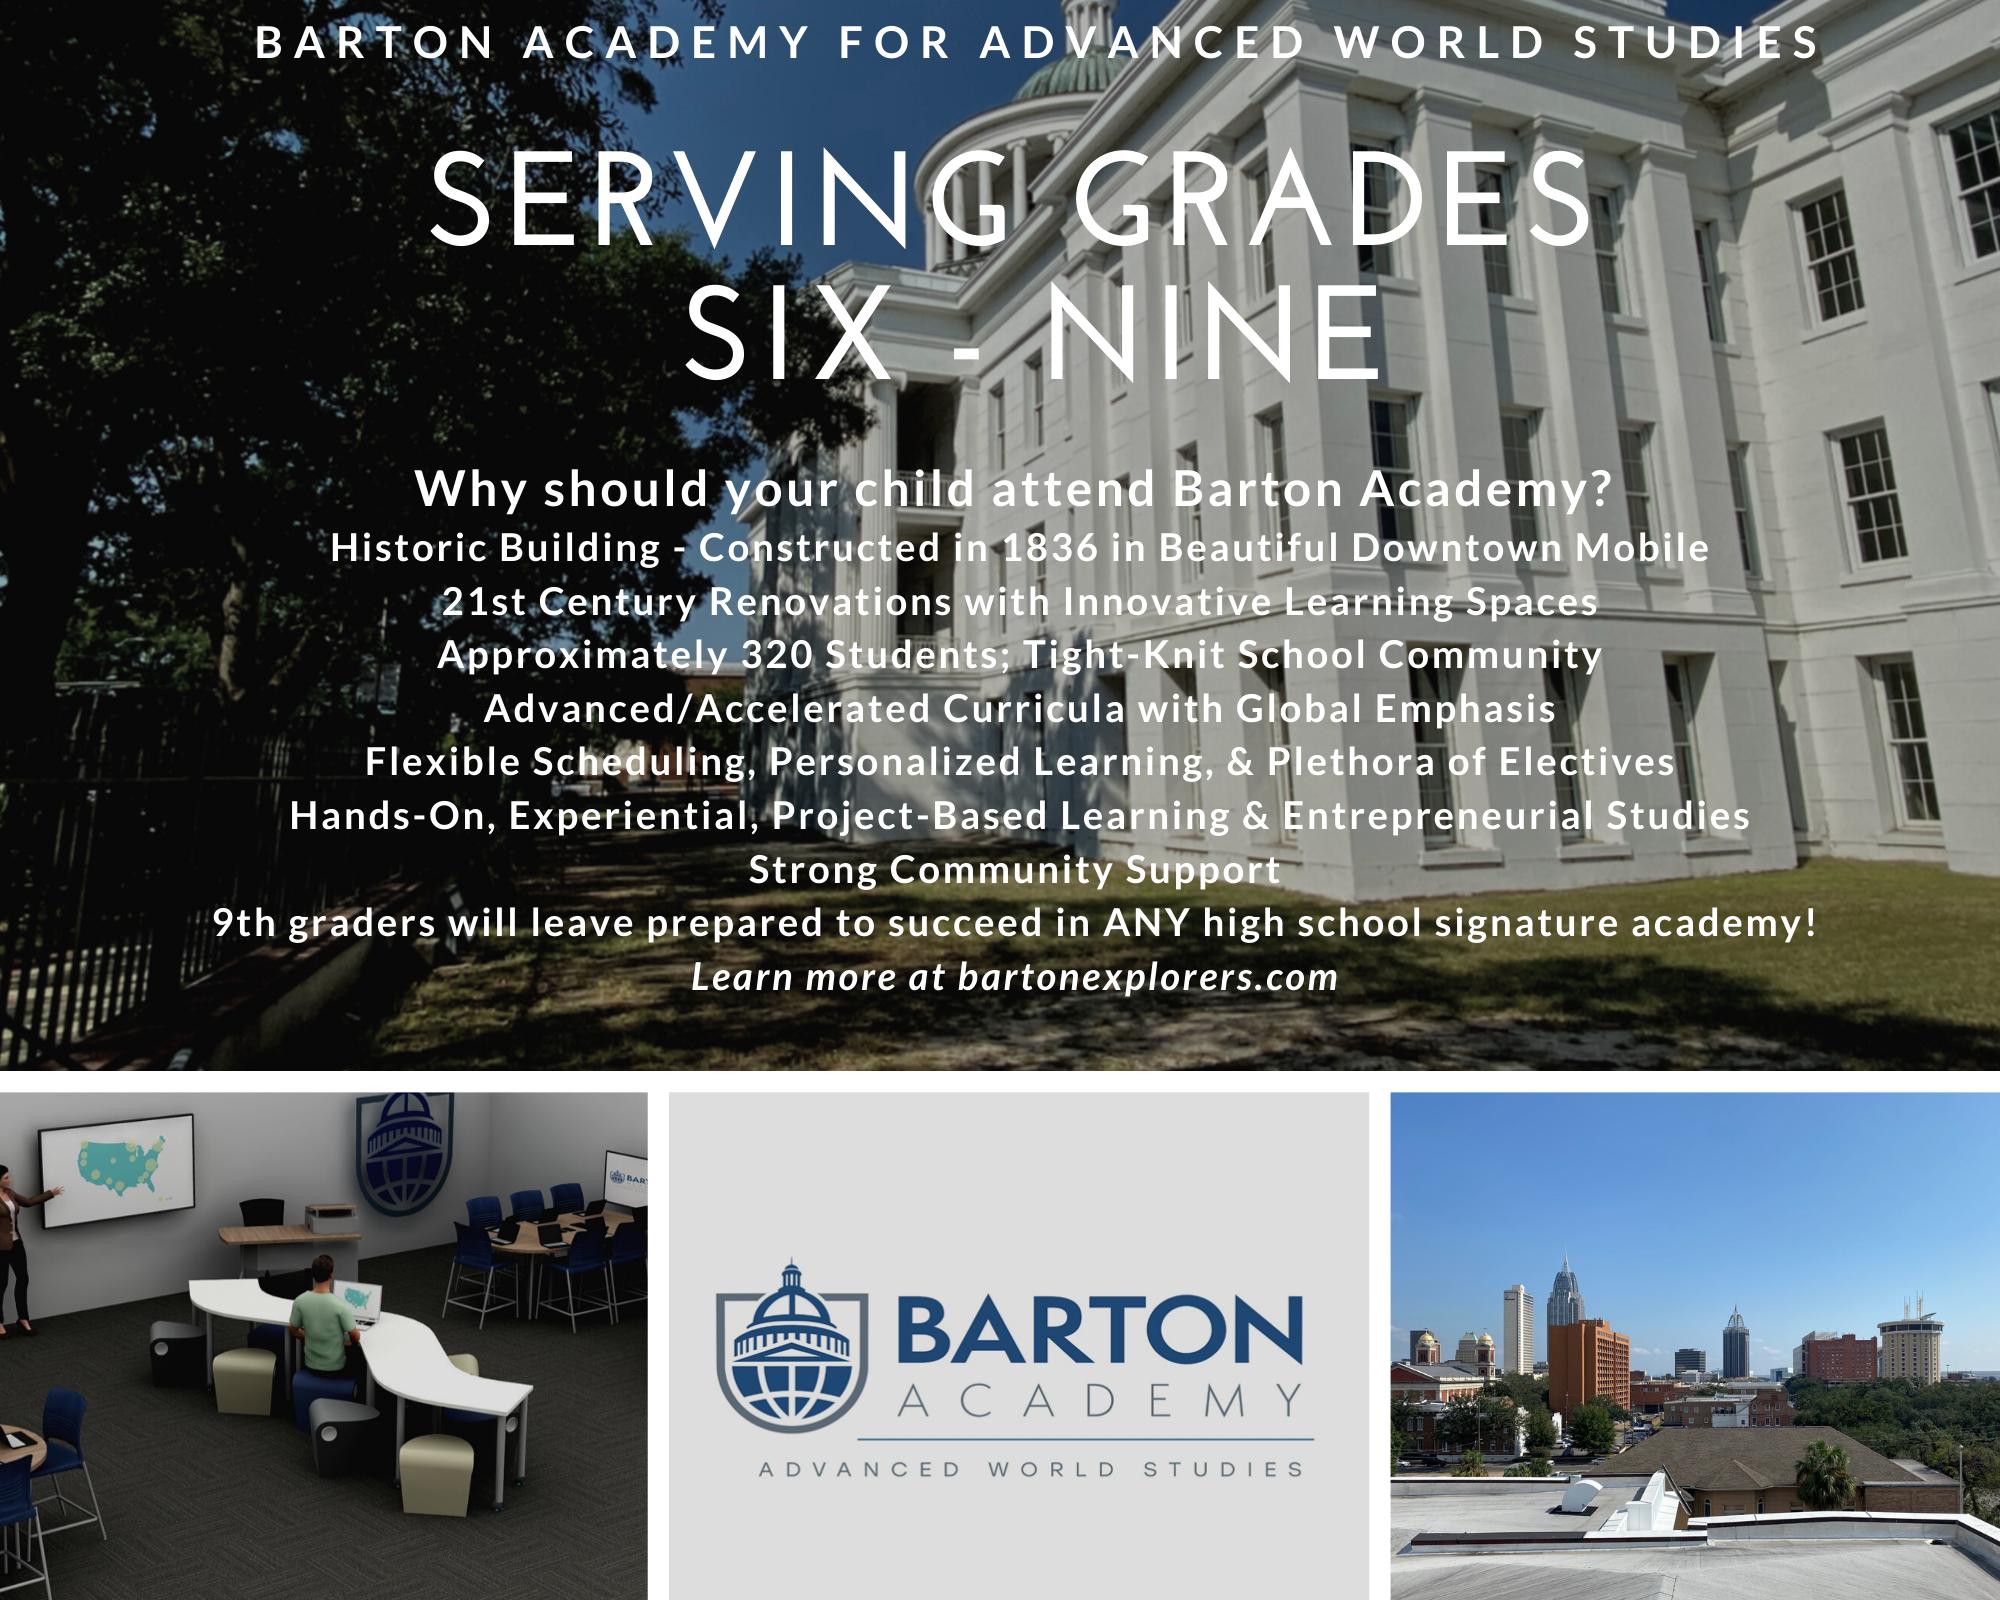 Serving Grades 6 through 9